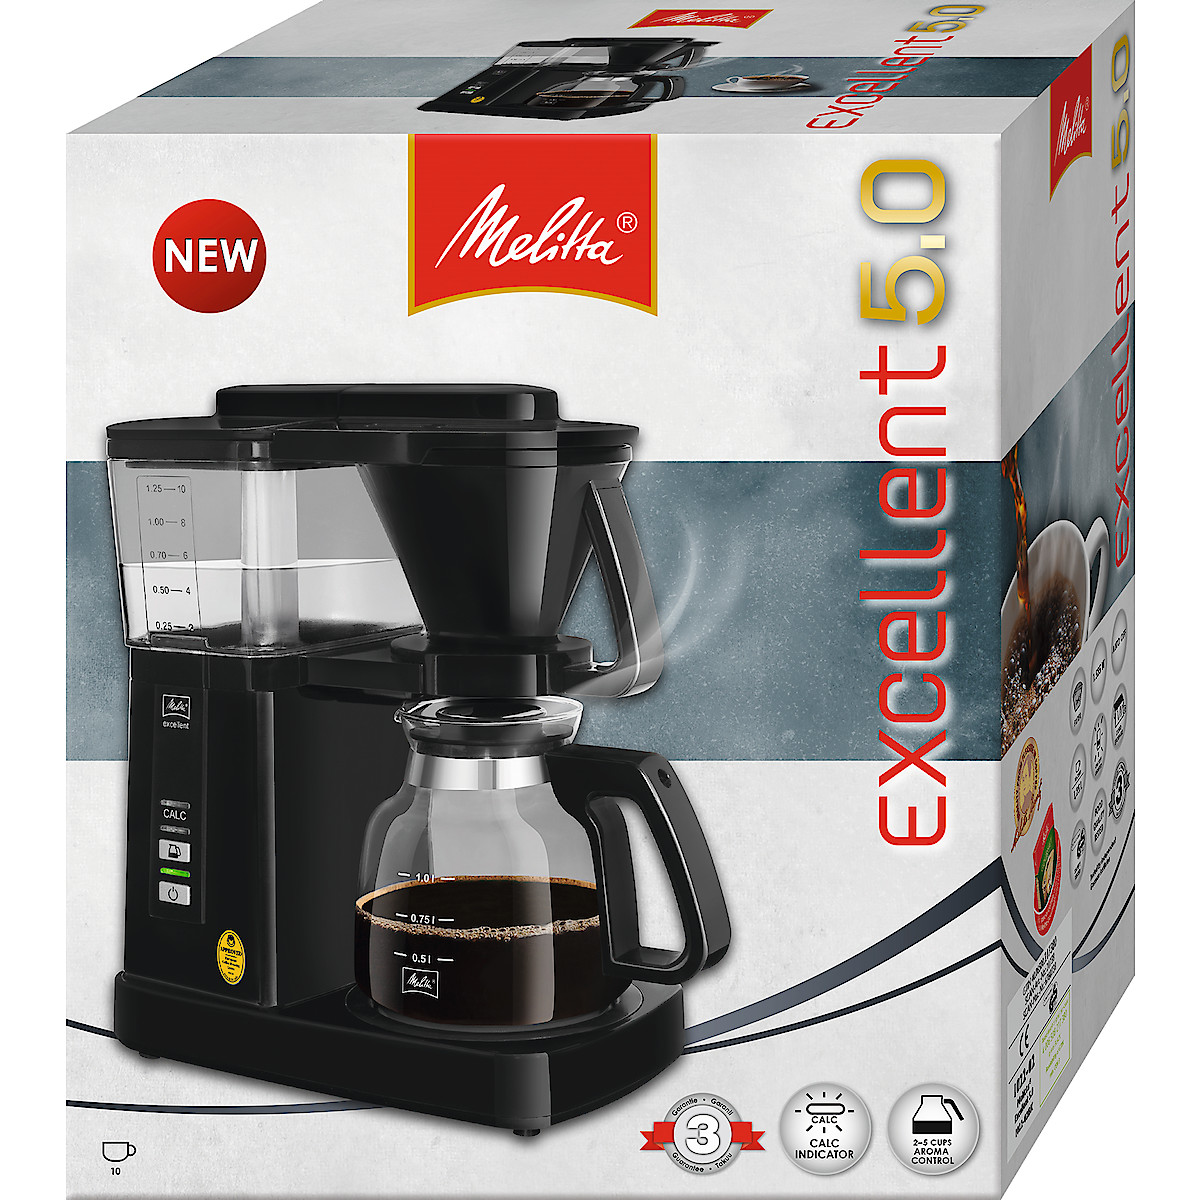 Kaffebryggare Melitta Excellent 5.0 Svart